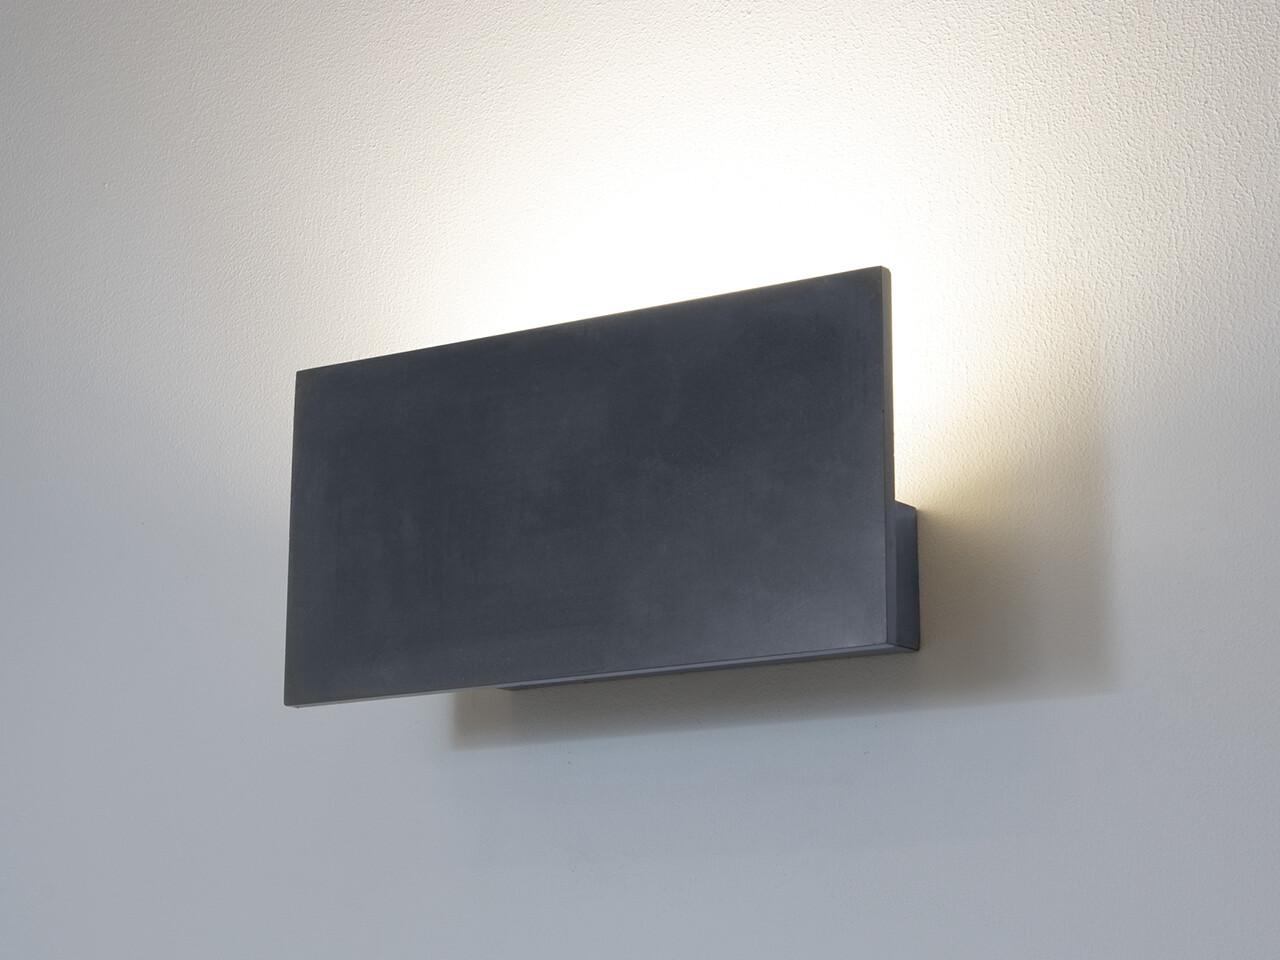 9010 Wandleuchte 1090 LED 10W, IP65, grau